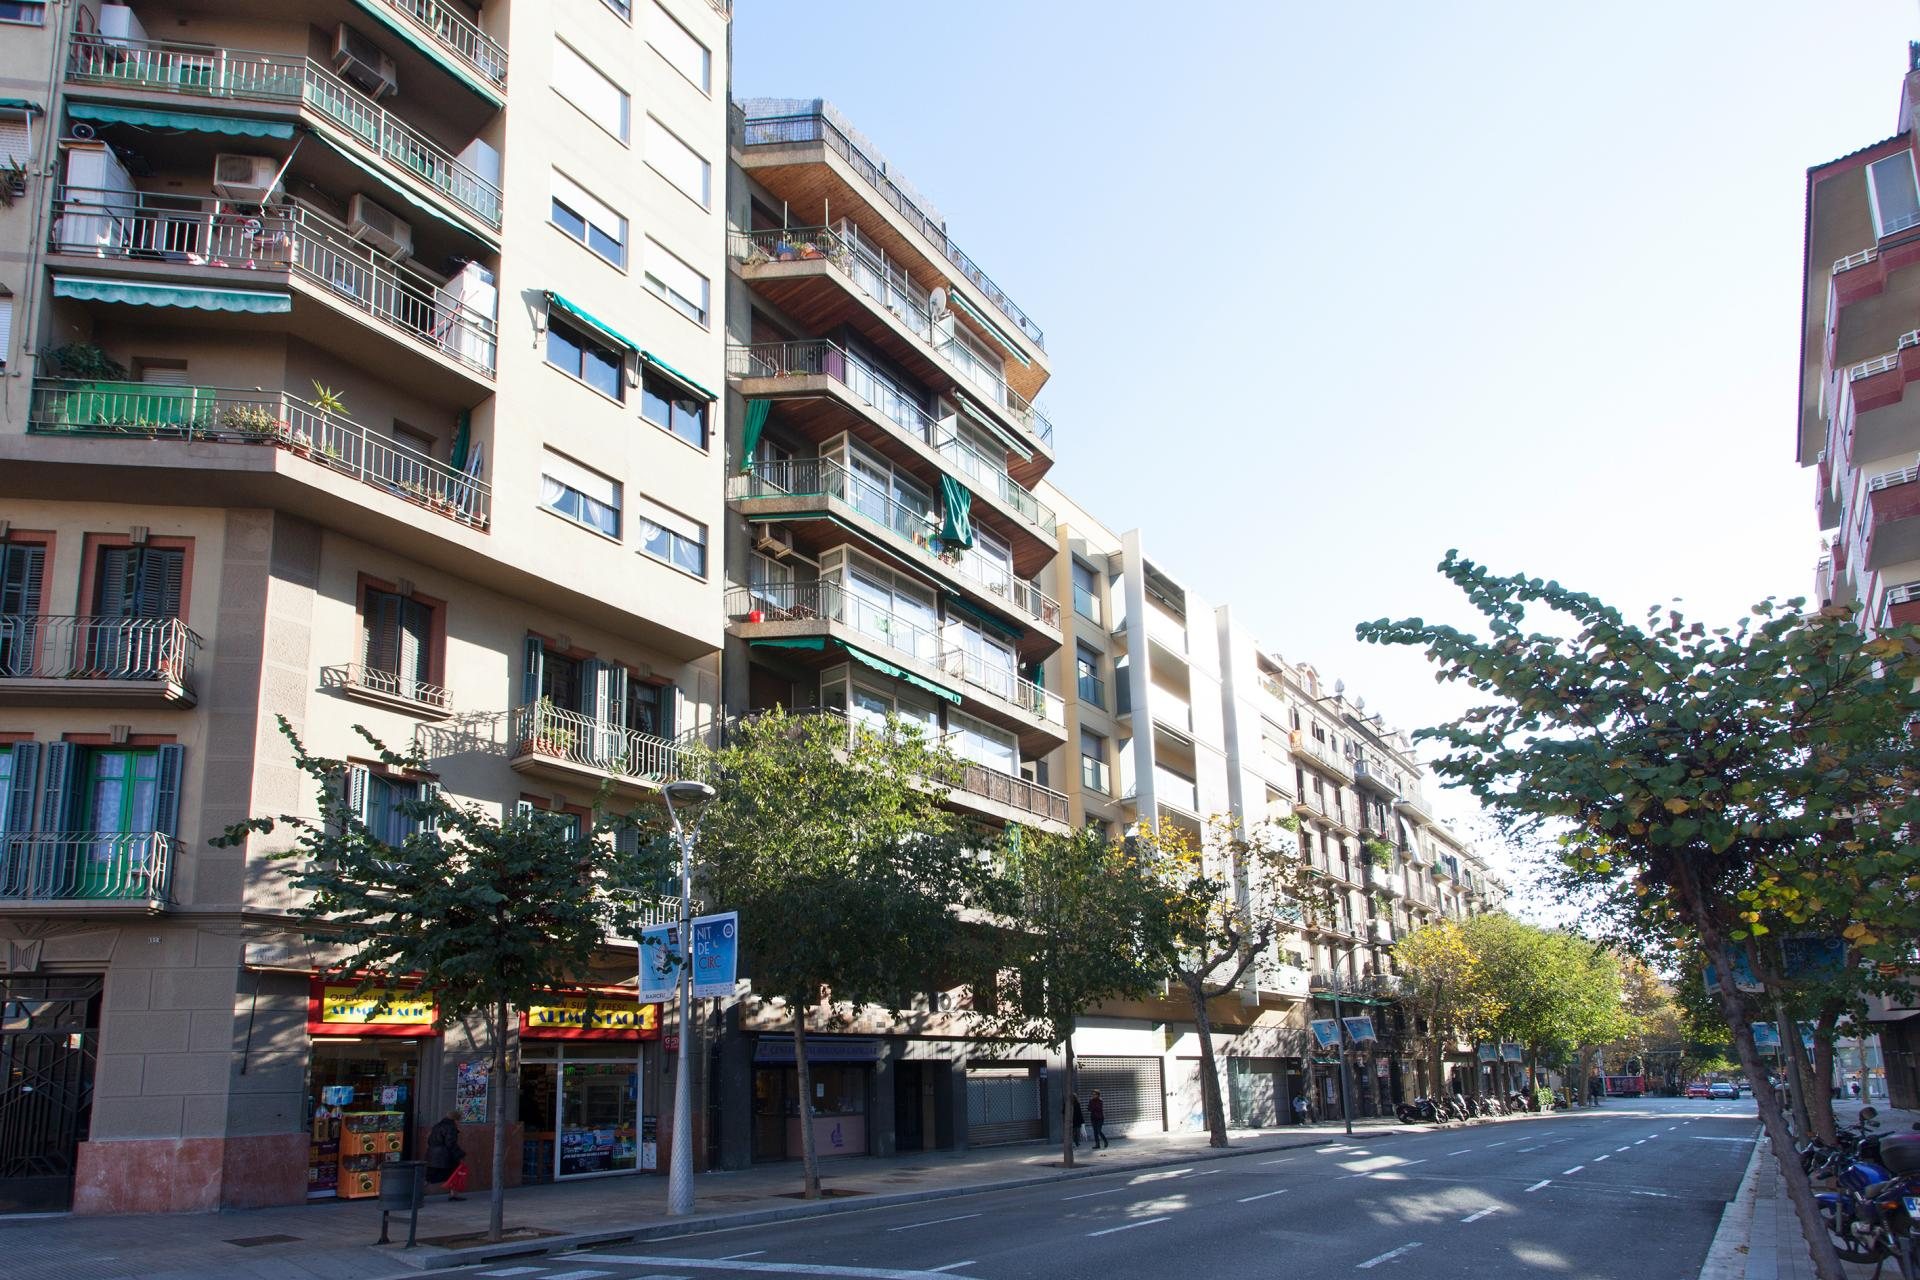 Piso en alquiler barcelona l 39 eixample enten a proven a - Alquiler pisos barcelona eixample ...